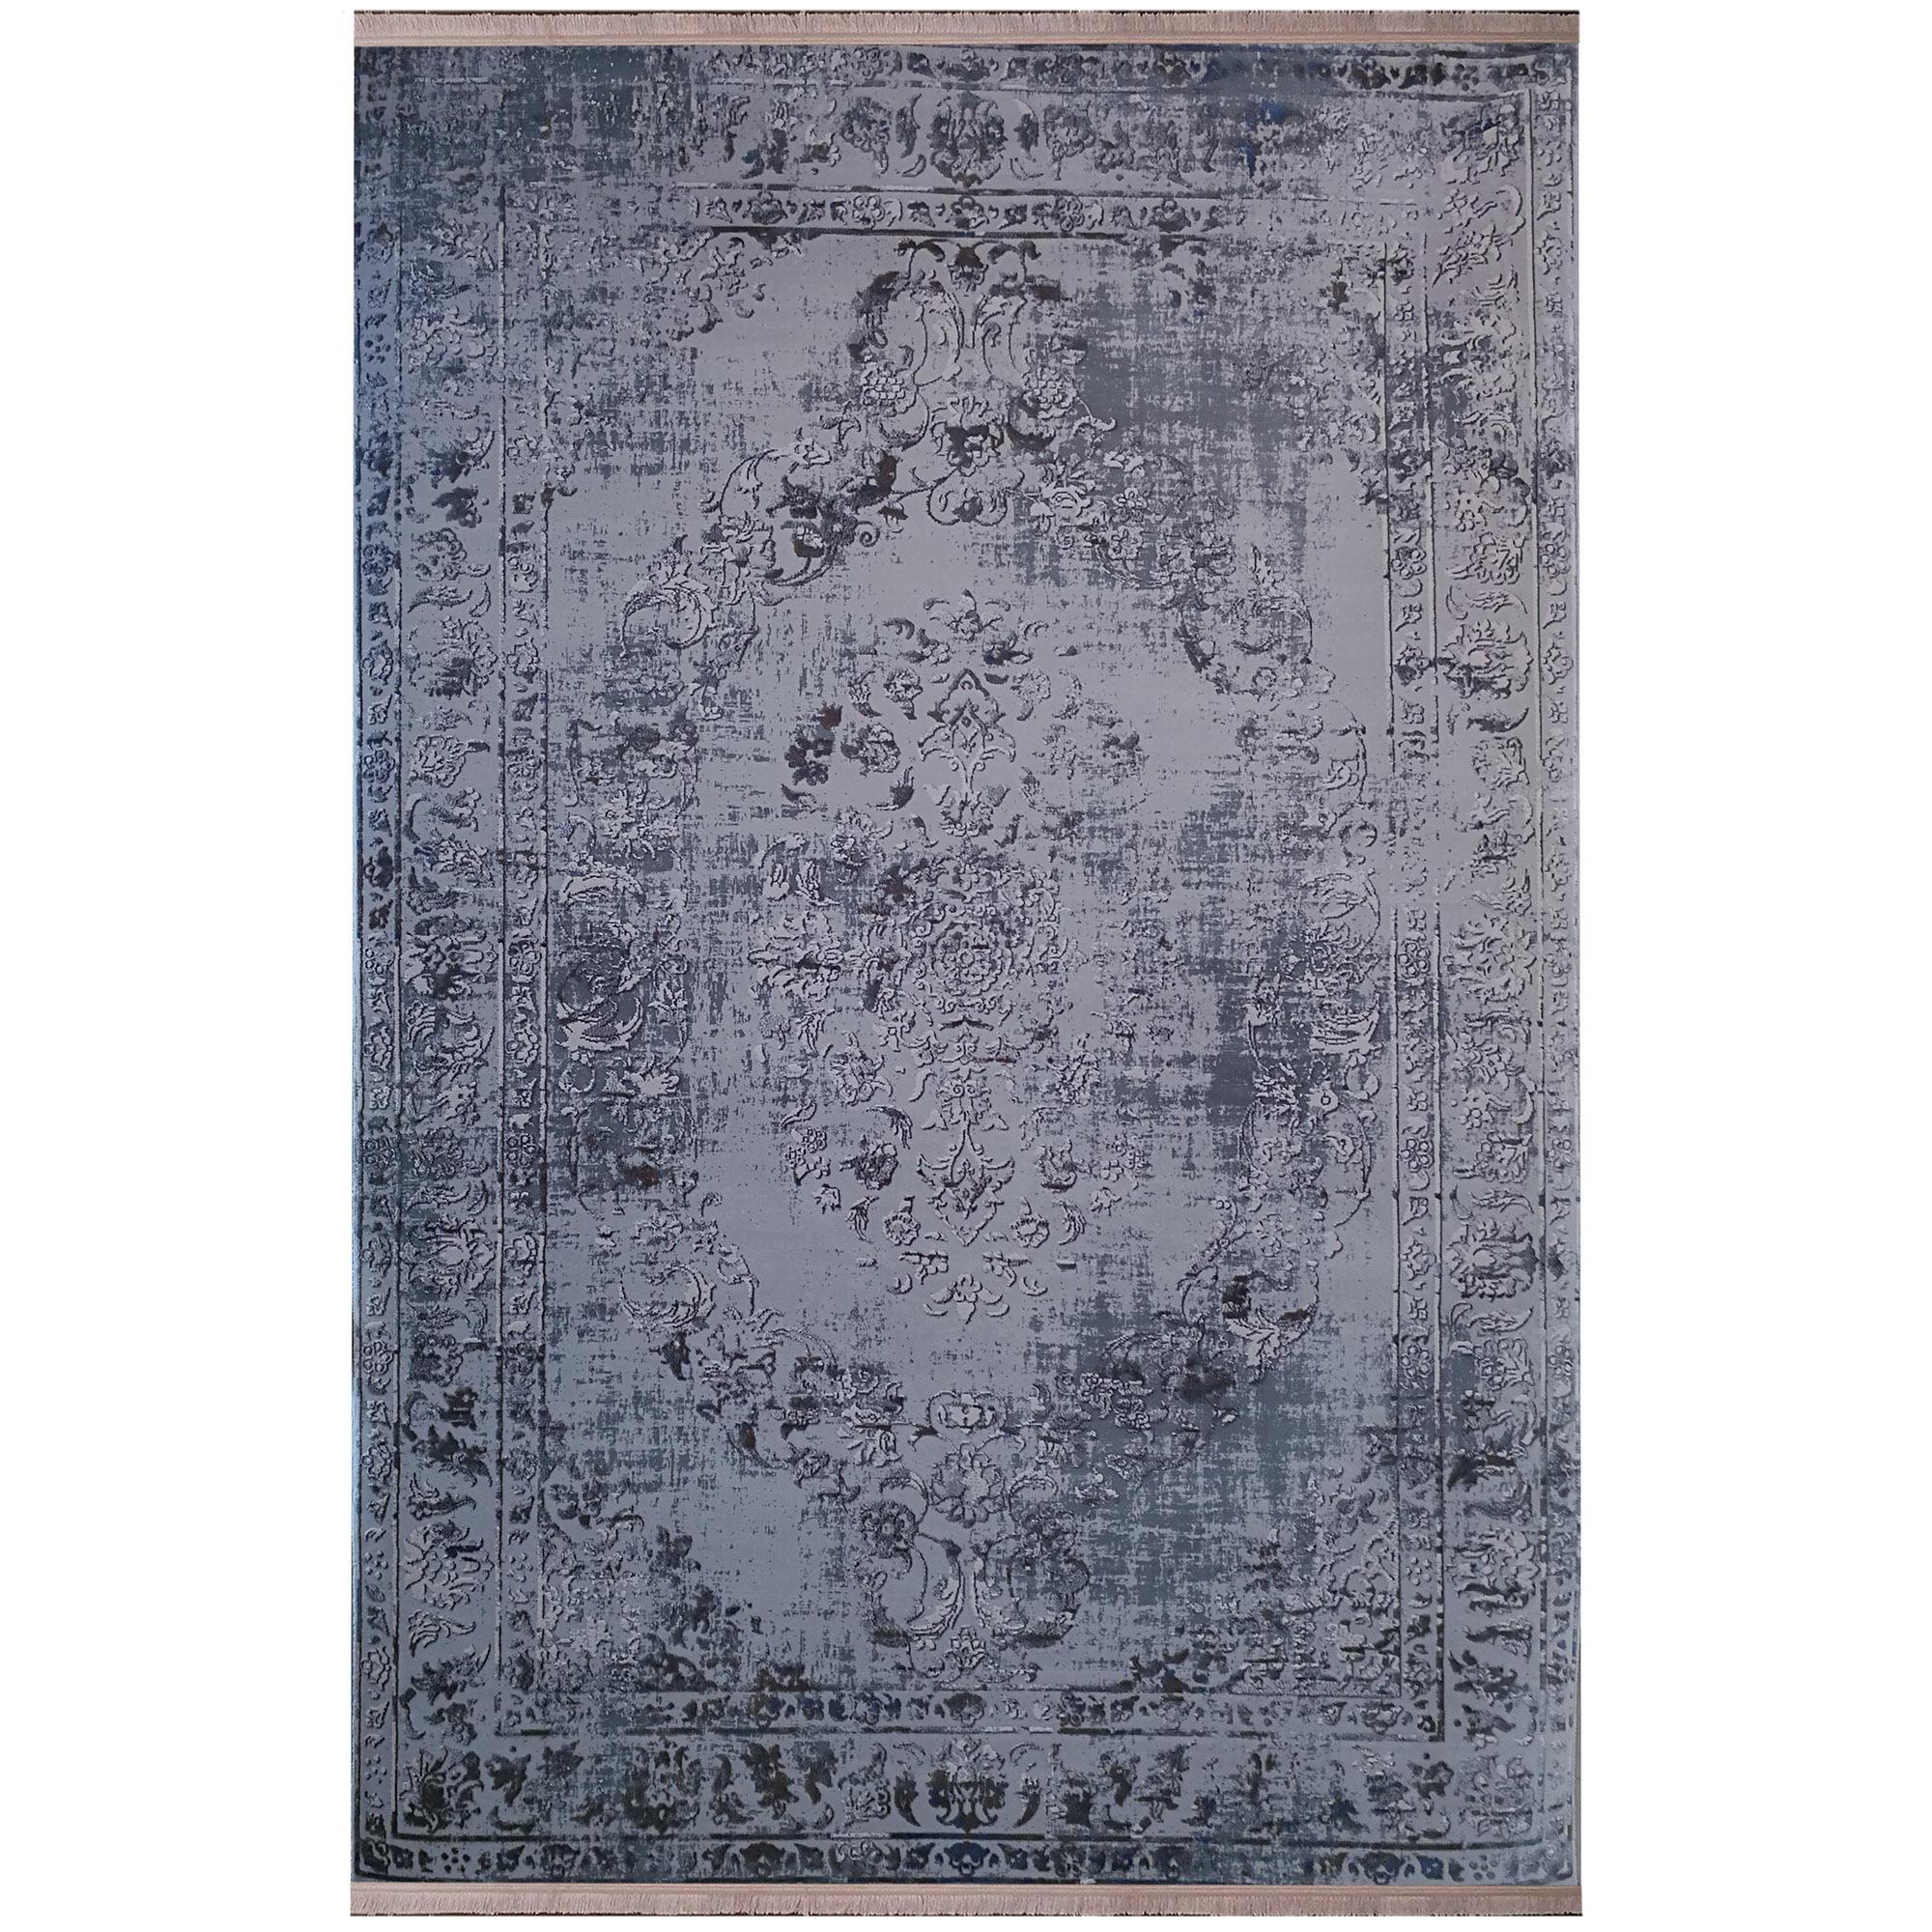 فرش ماشینی زمرد مشهد طرح پتینه کد TA105 زمینه طوسی